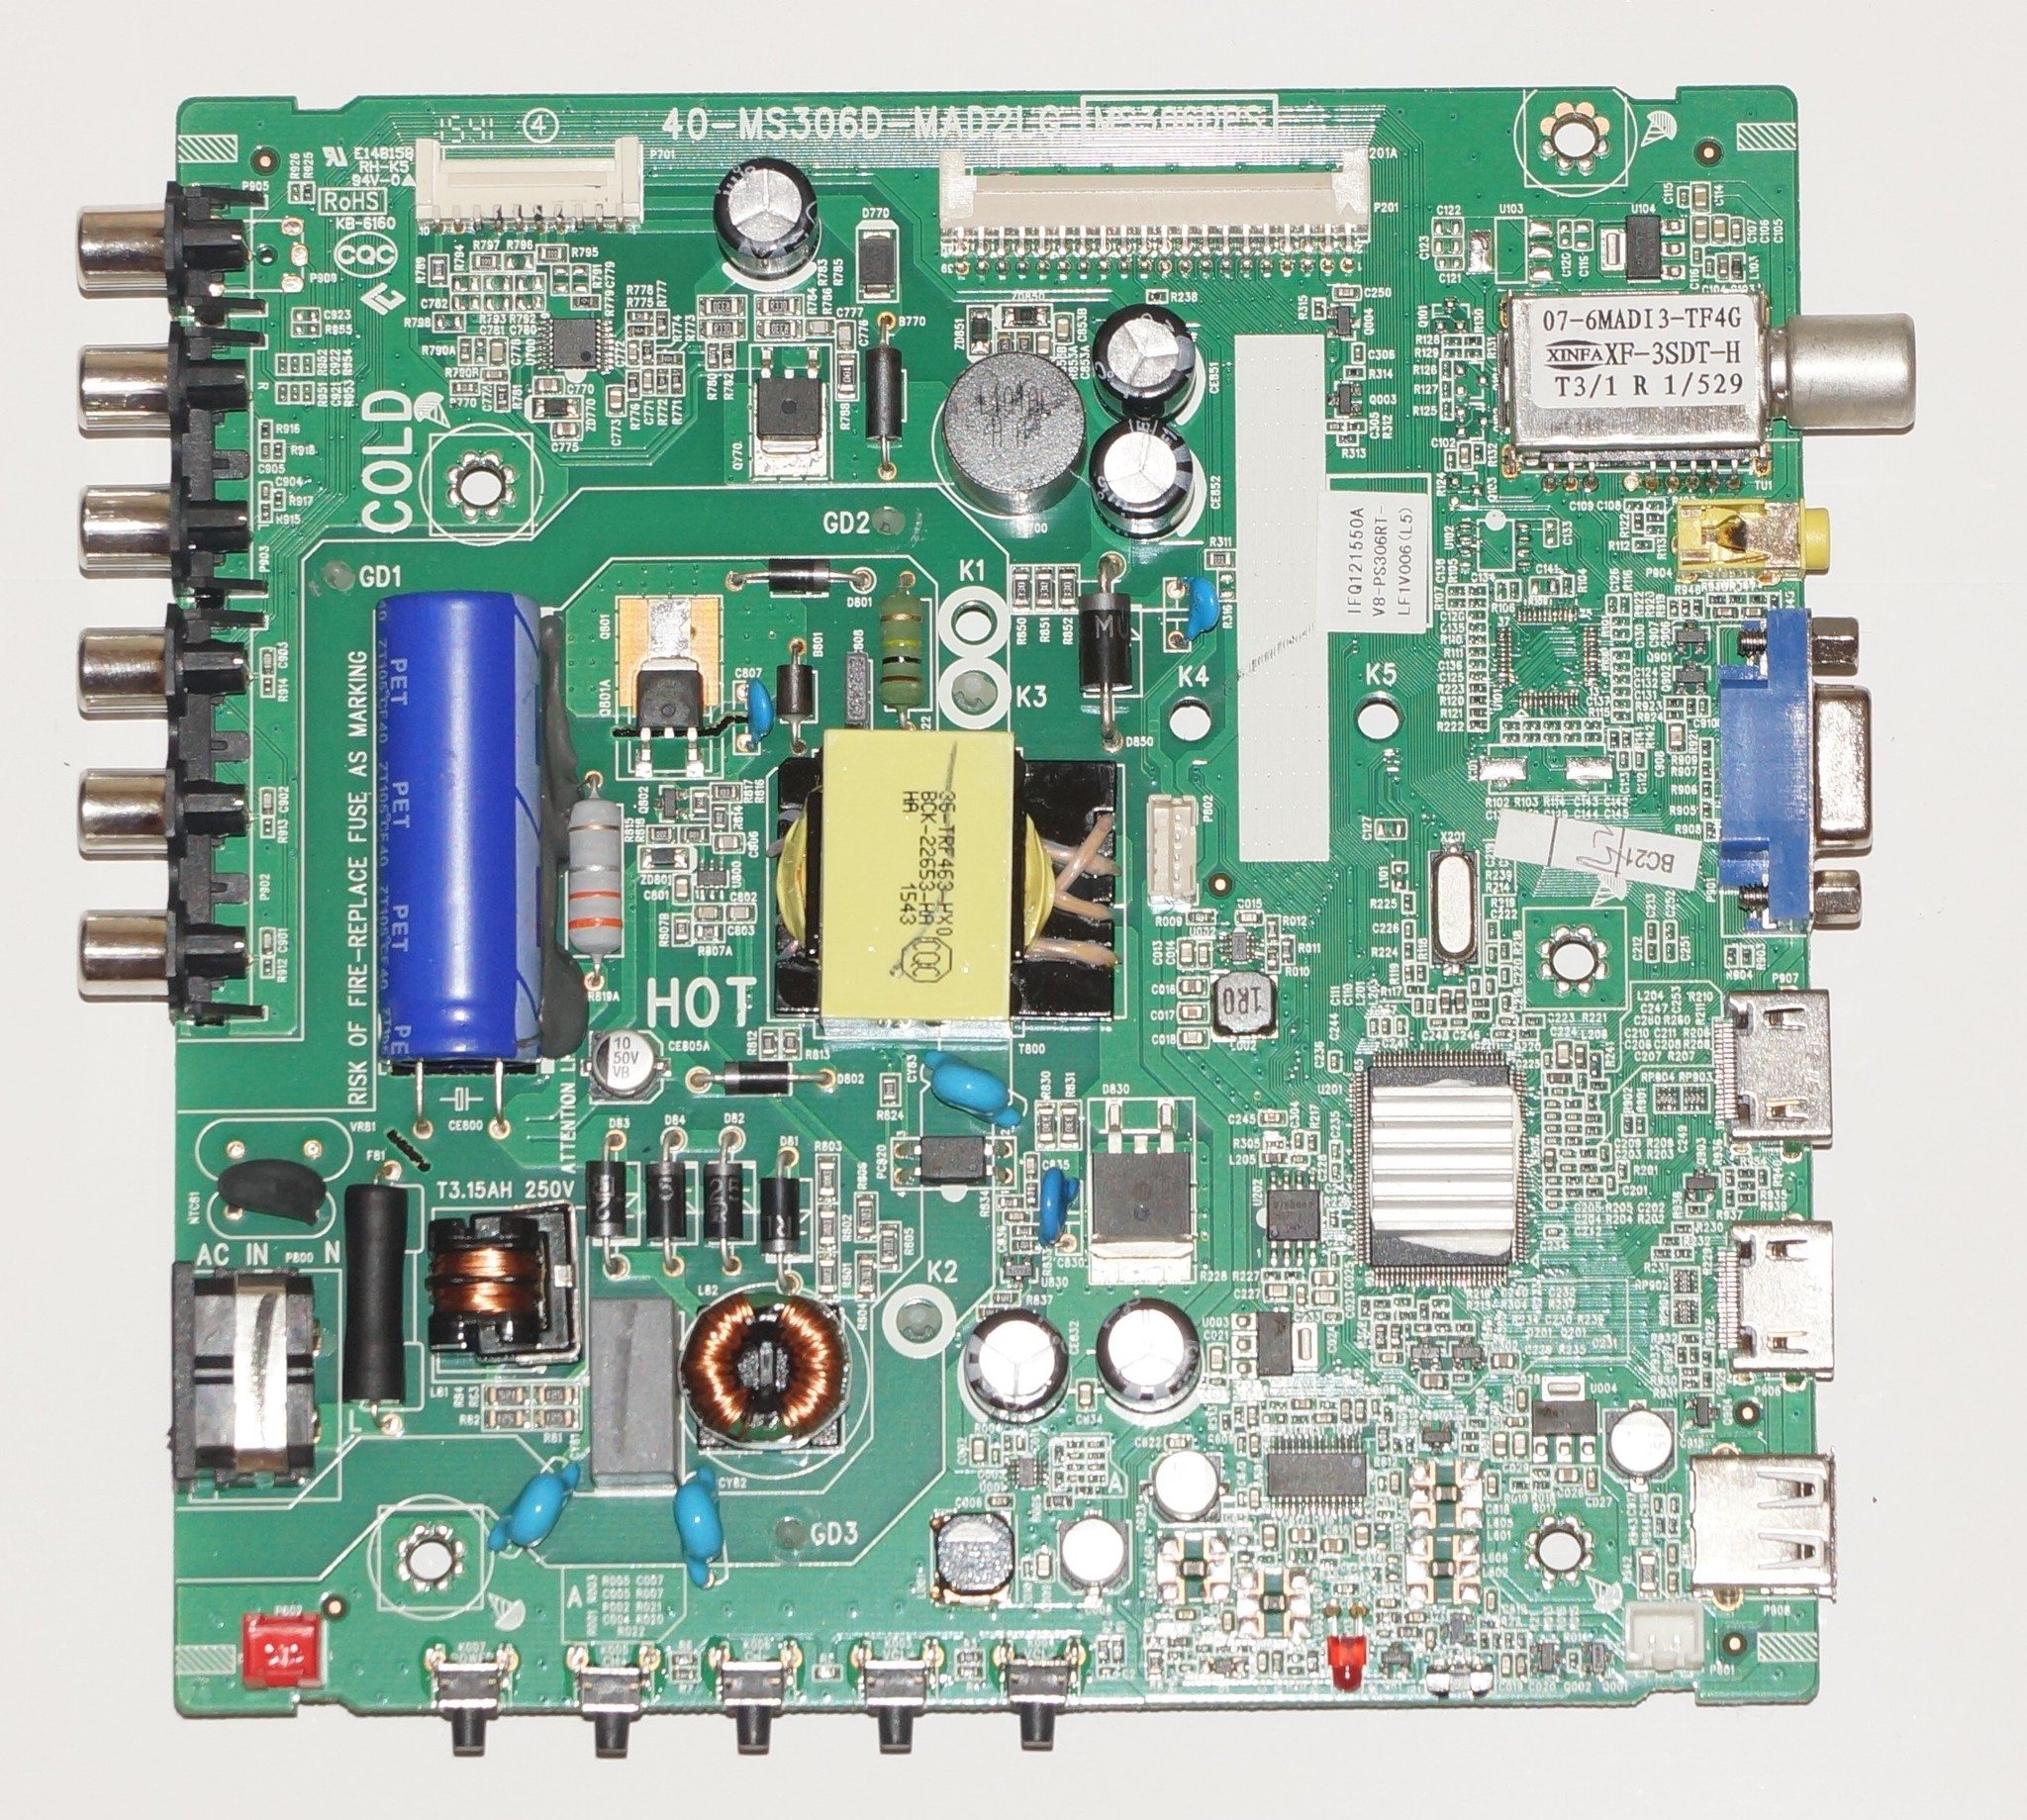 40-MS306D-MAD2LG MS306DPS IFQ121550A mainboard телевизора TELEFUNKEN